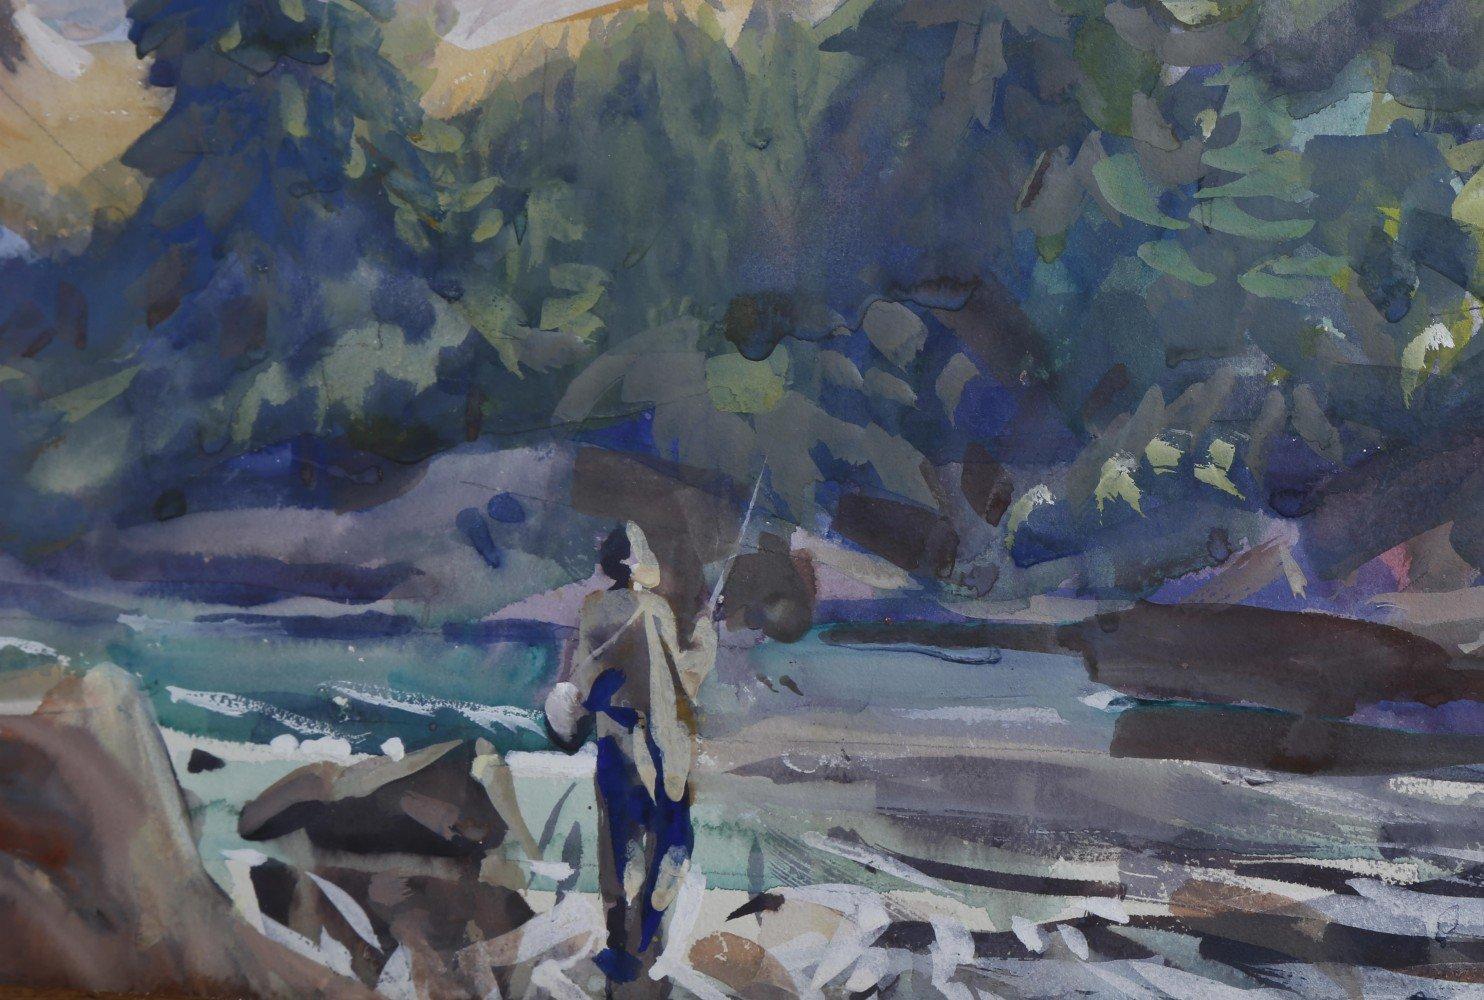 Landscape Watercolor on Whatman Board Painting: